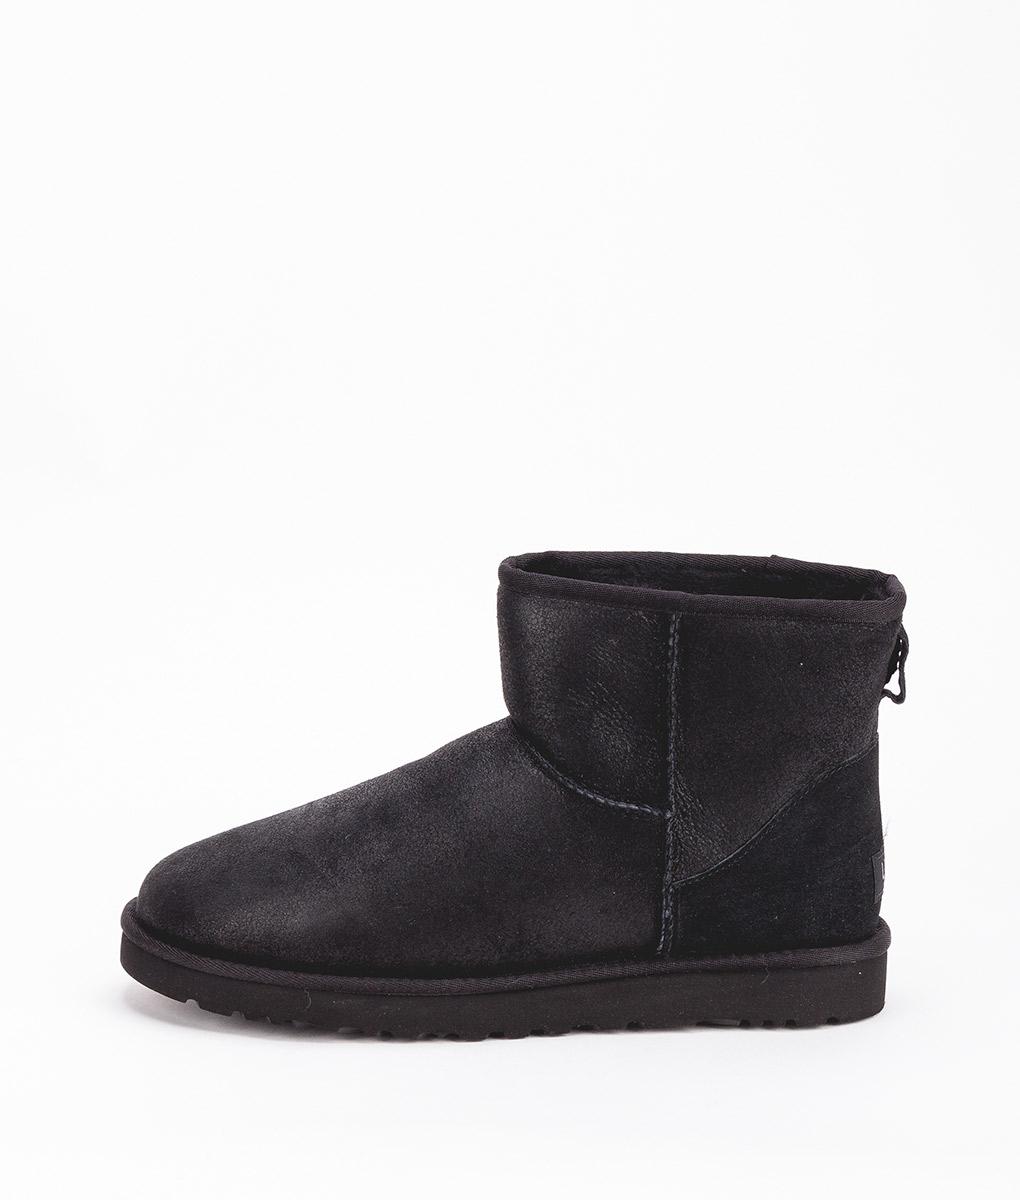 71ced5cf396 UGG Men Ankle Boots 1007307 CLASSIC MINI BOMBER, Jacket Black